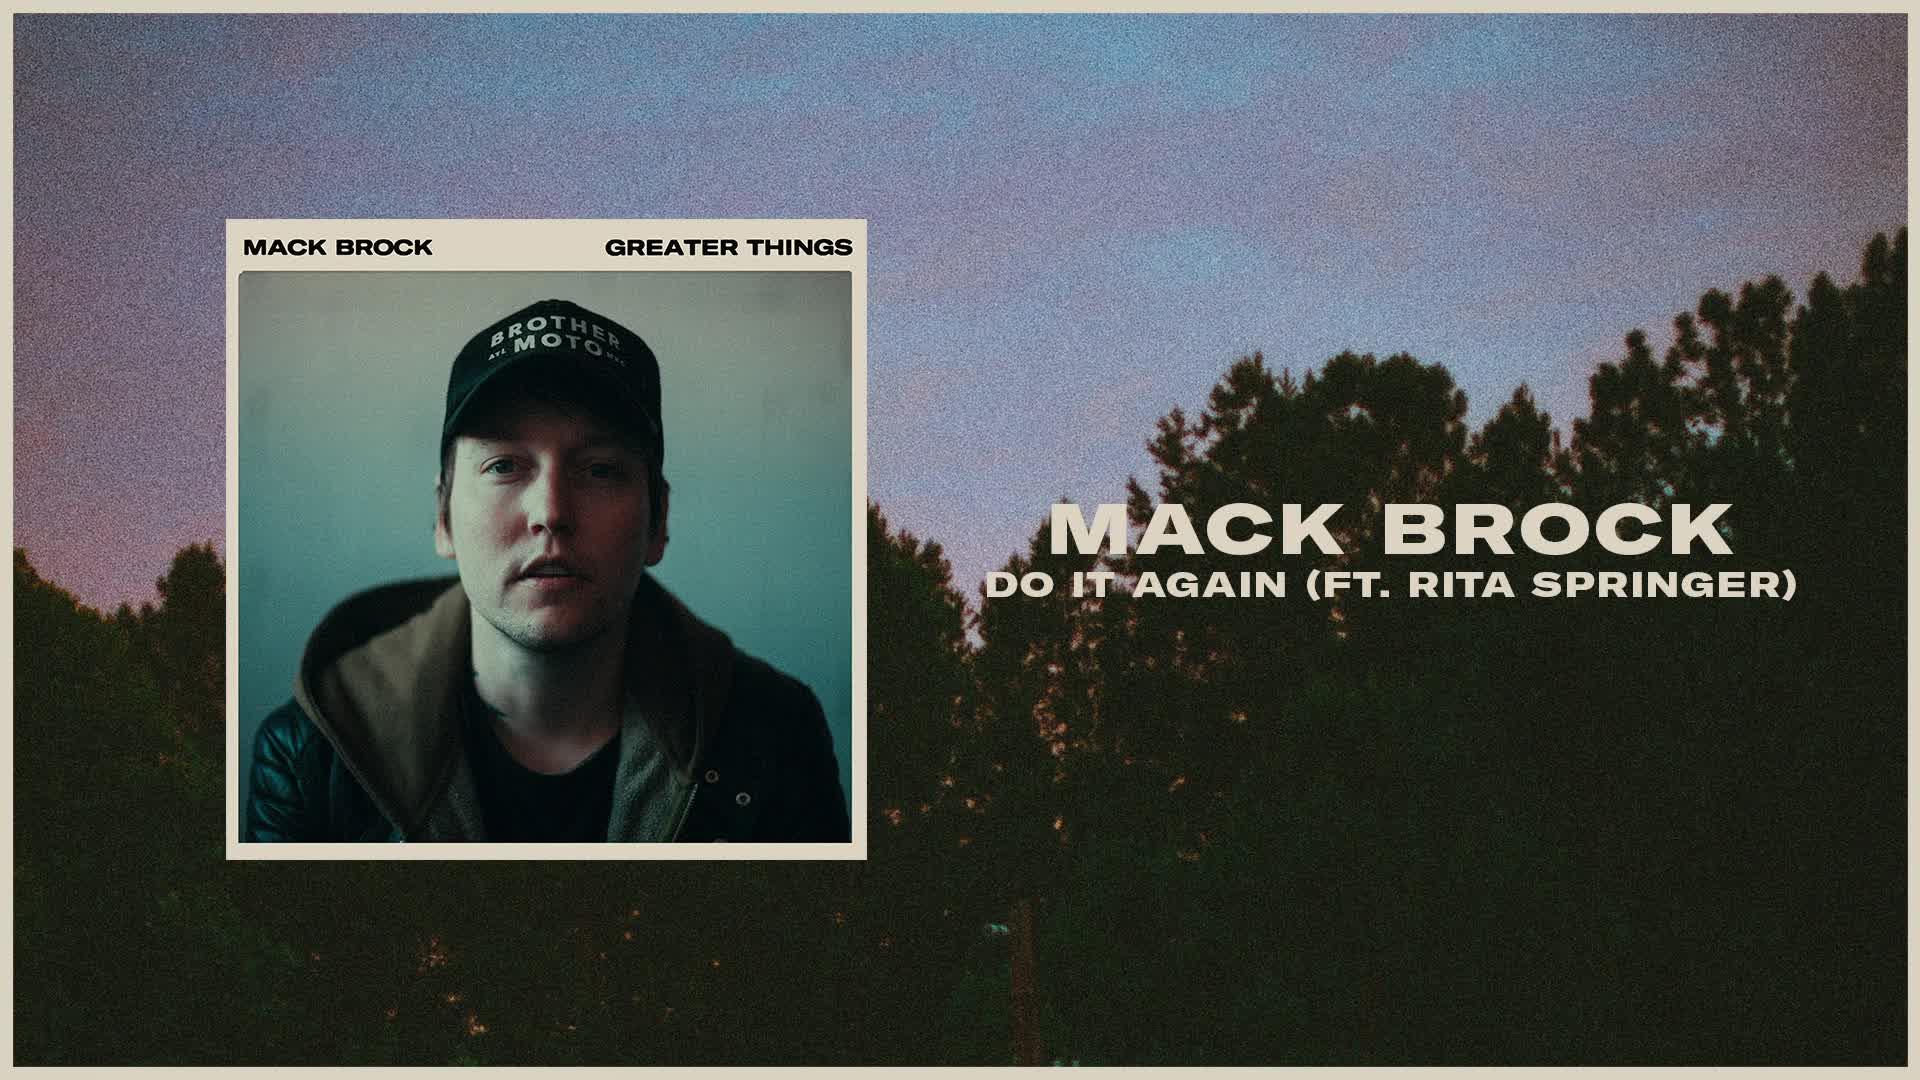 Mack Brock - Do It Again